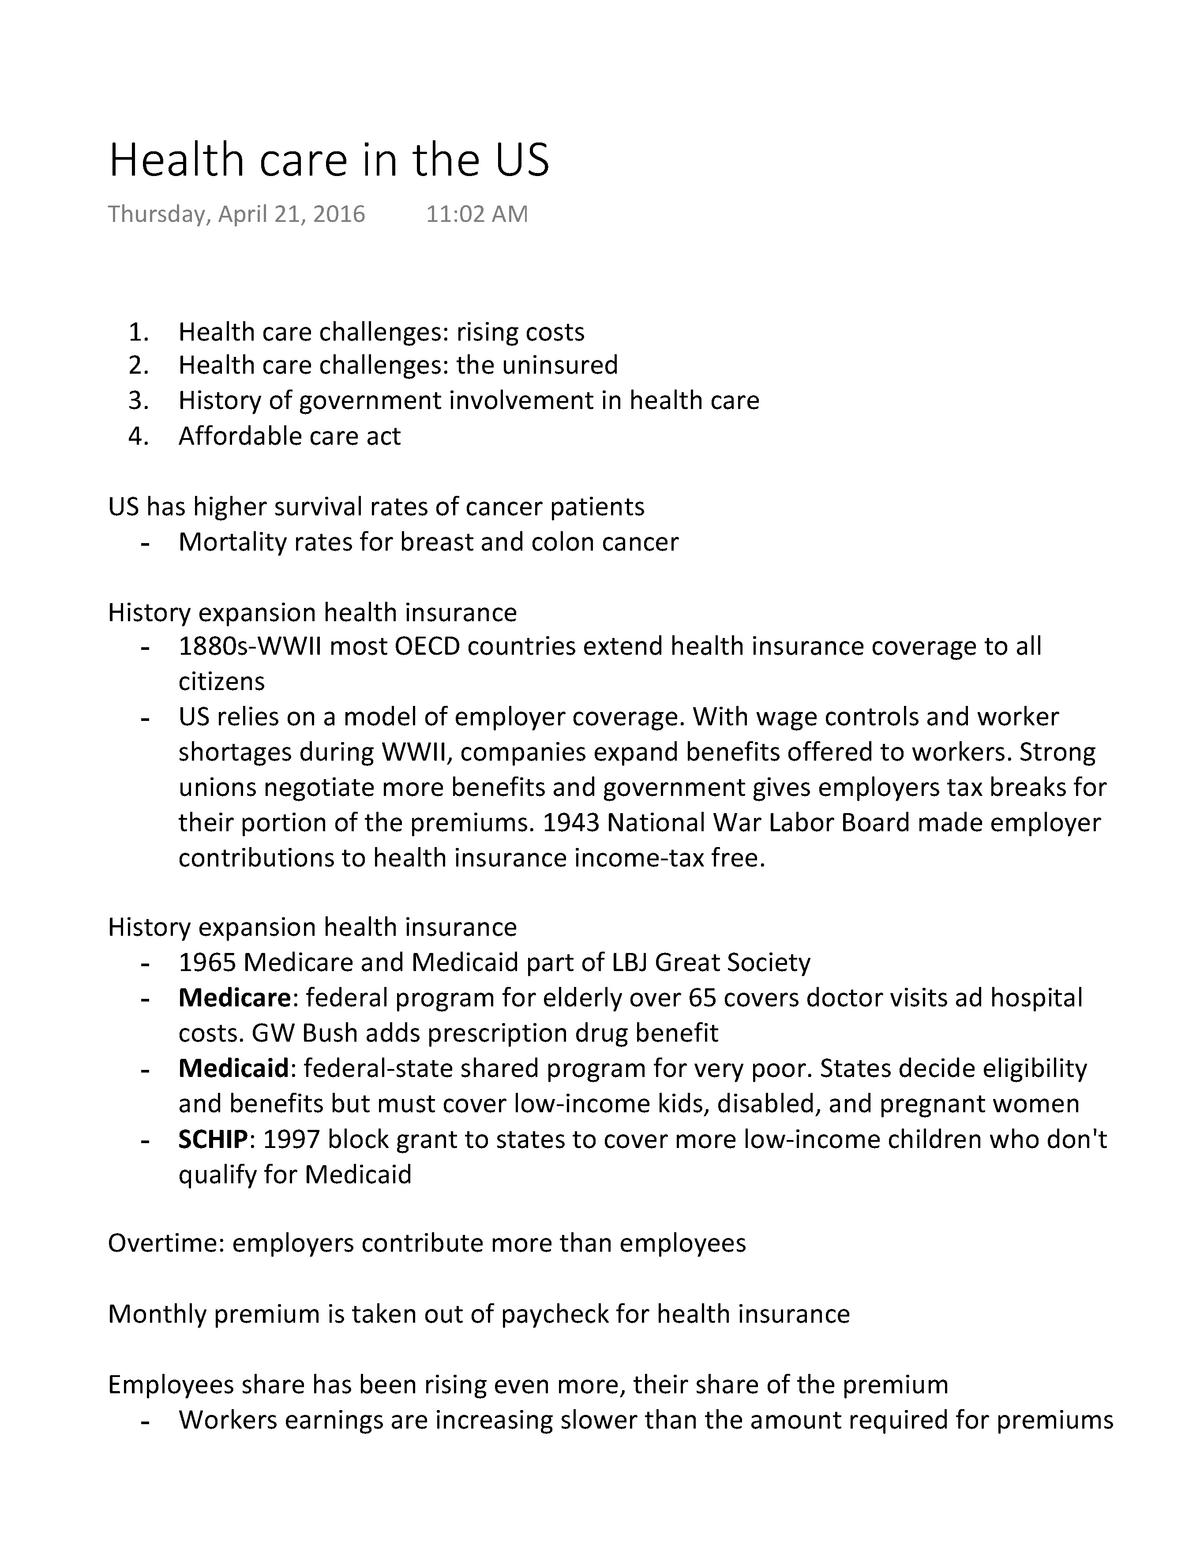 Health care in the US - Swers - GOVT 020 - StuDocu